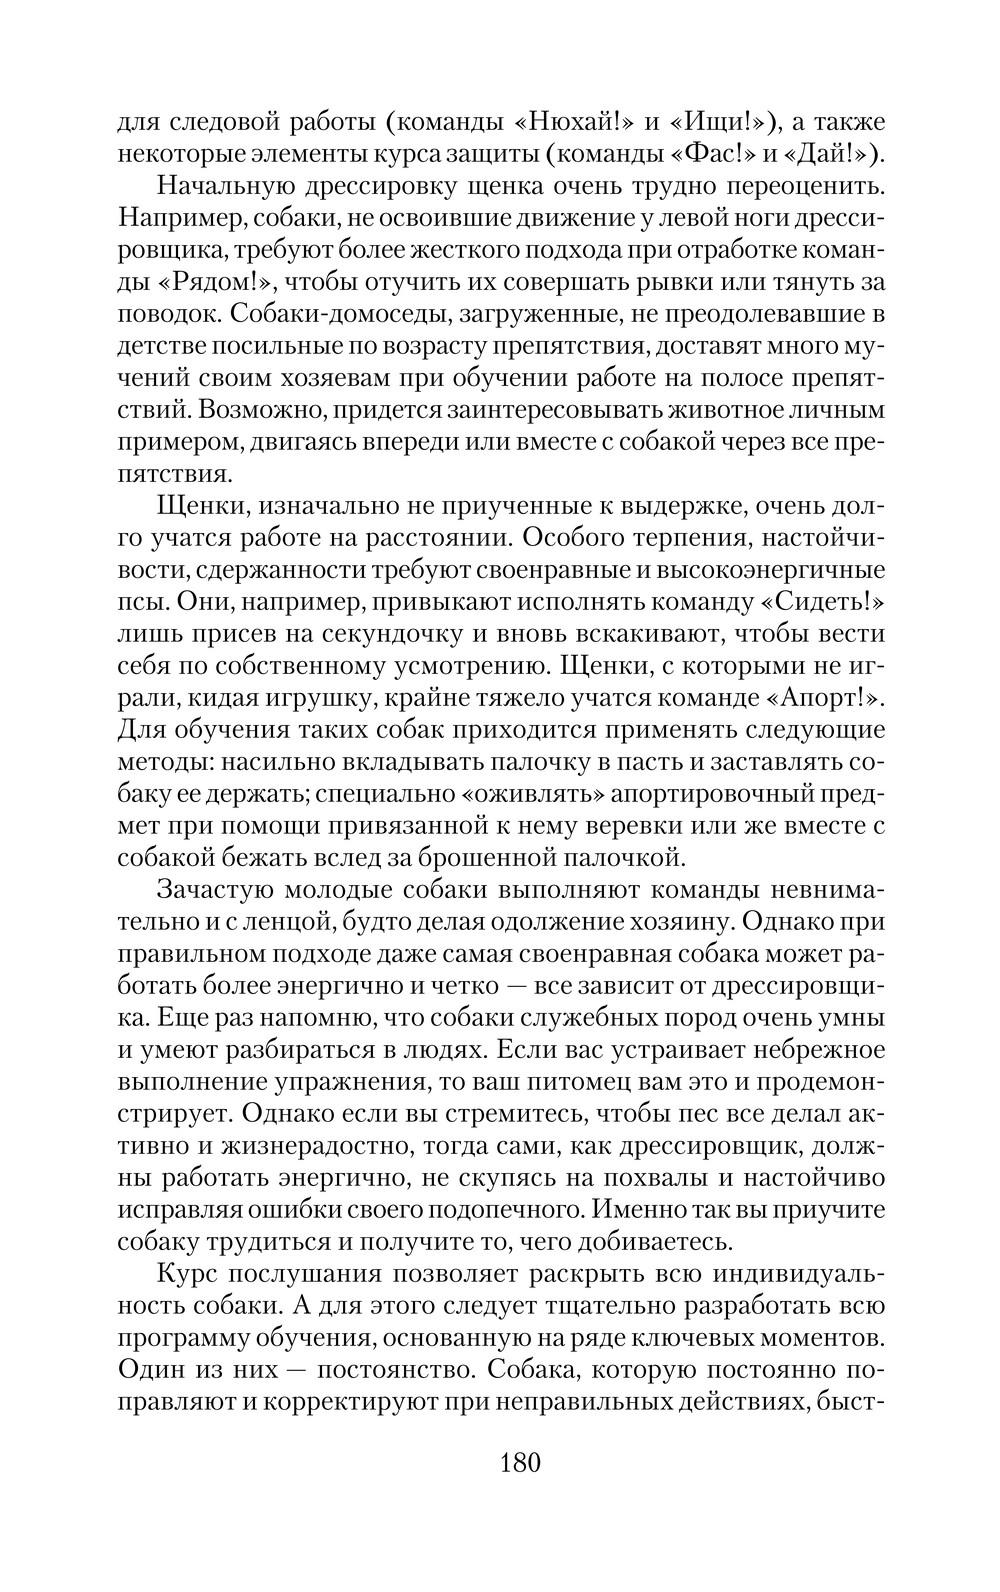 http://i5.imageban.ru/out/2014/01/12/d4e21aaf03701ef3de159bba9f233027.jpg